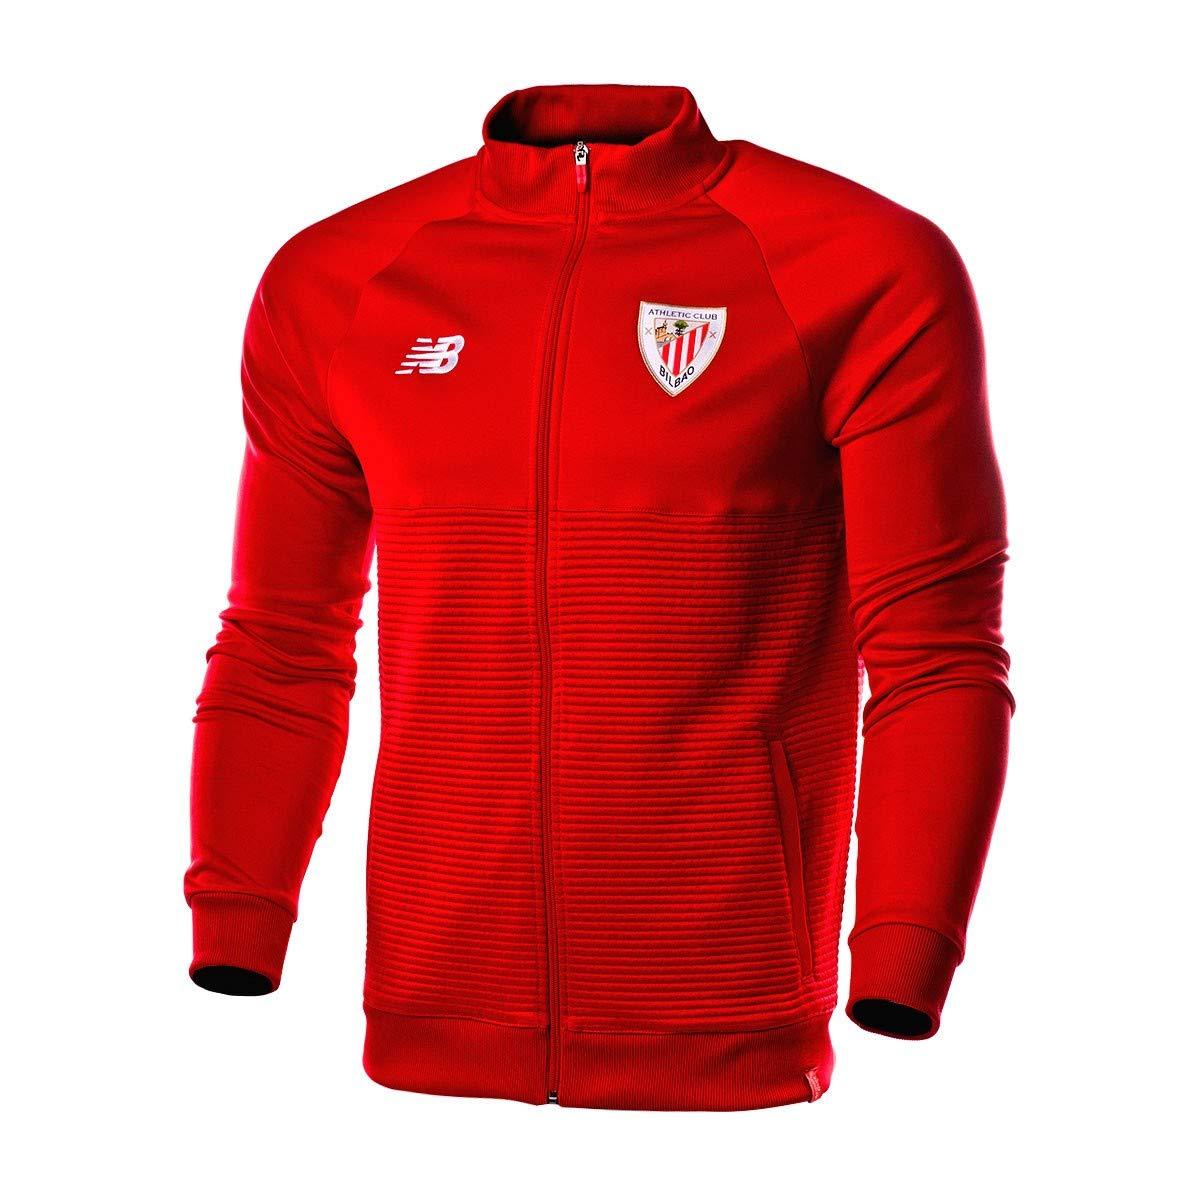 New Balance AC Bilbao Walkout 2018-2019, Chaqueta, Red, Talla XXL: Amazon.es: Deportes y aire libre